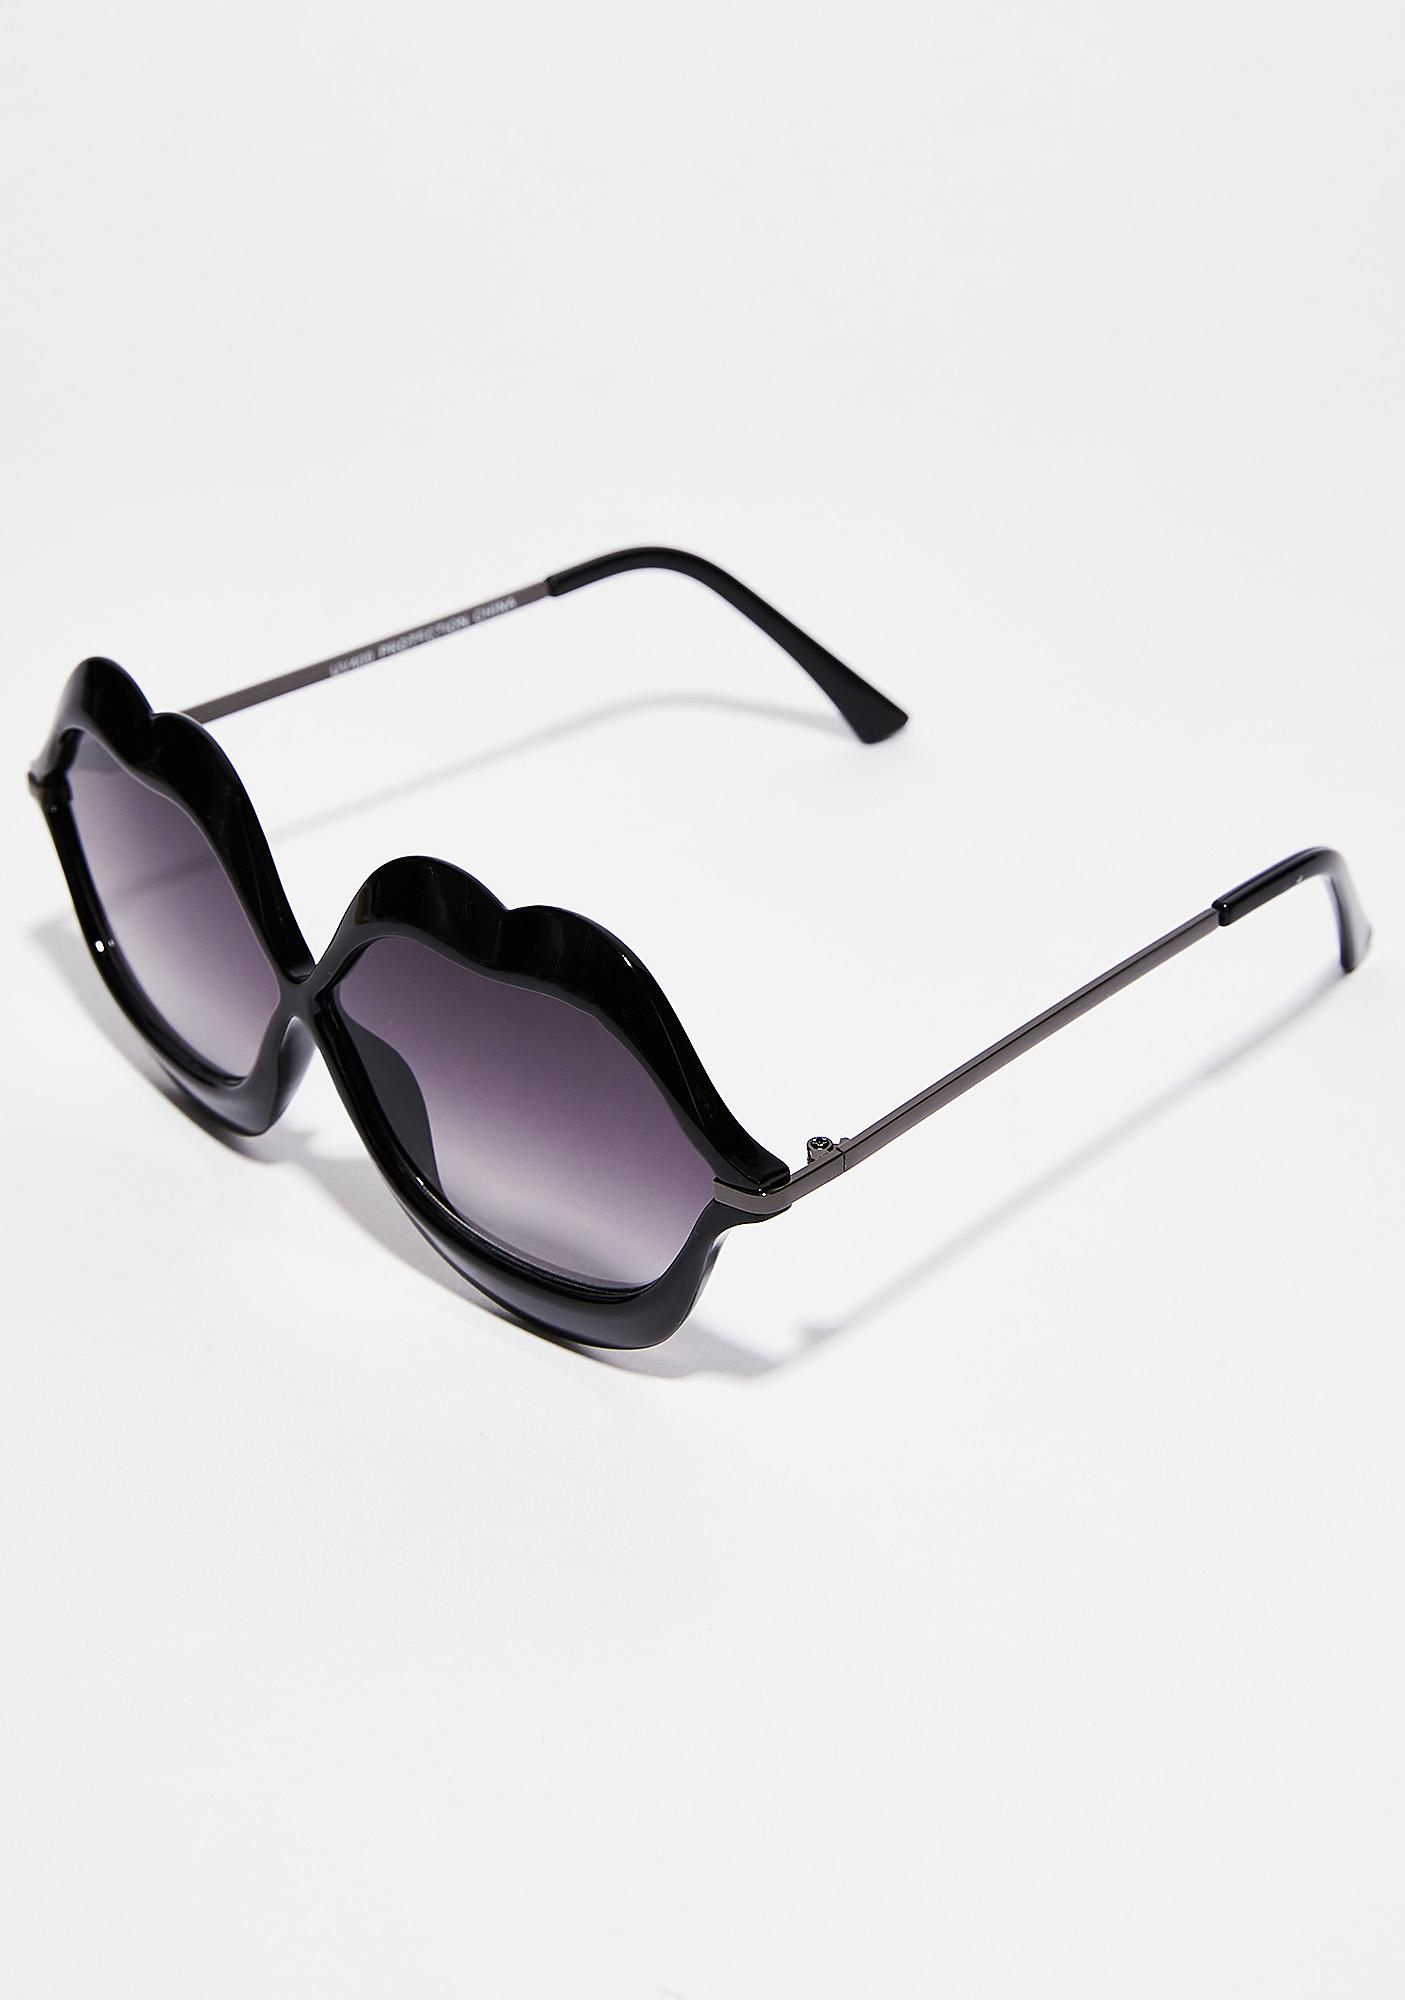 Dark Read My Lips Sunglasses